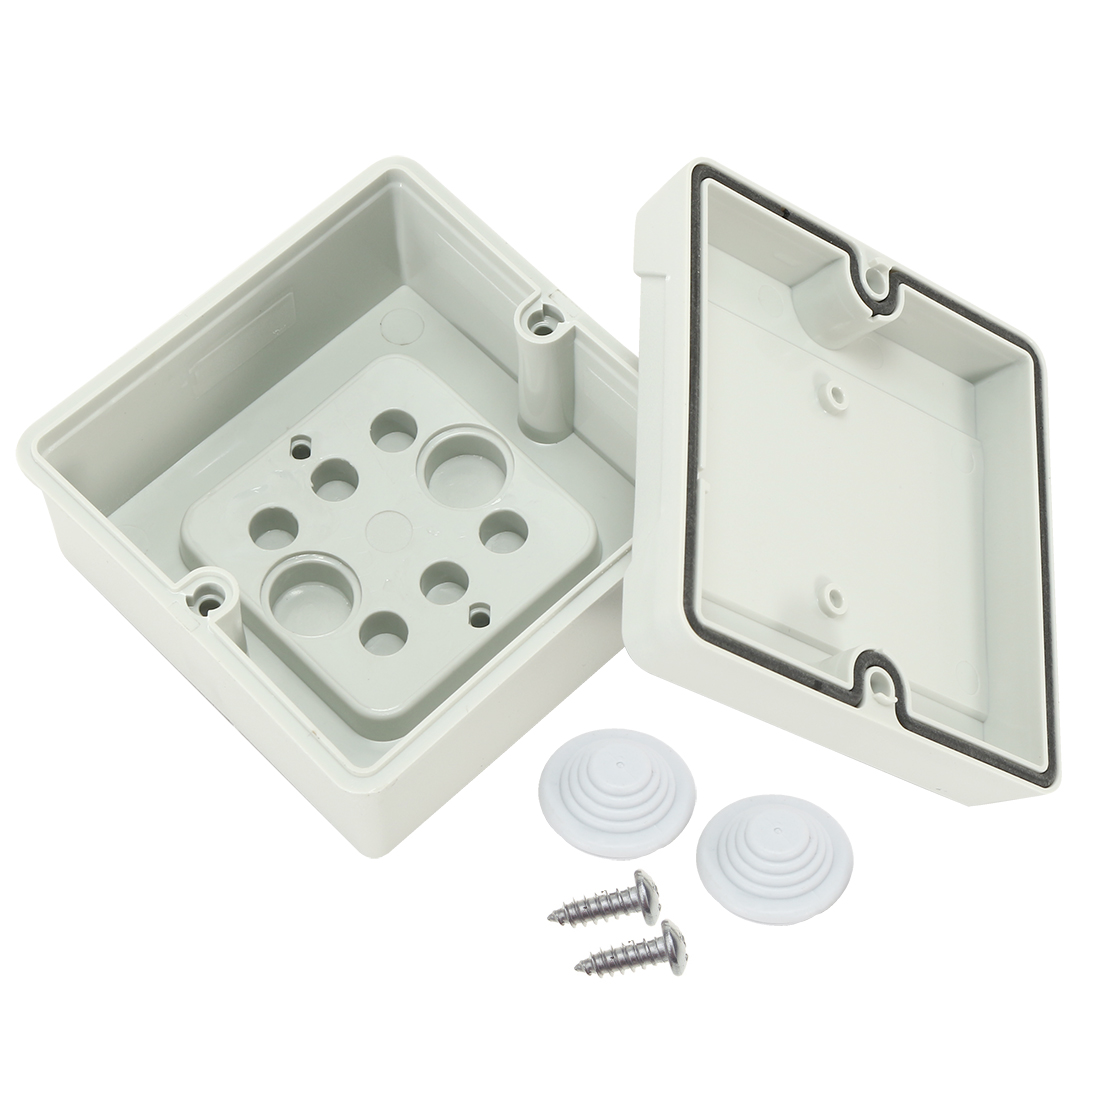 "3.5""x3.5""x2.1""(88mmx88mmx53mm) ABS Flame Retardant Dustproof IP66 Junction Box Universal Project Enclosure"